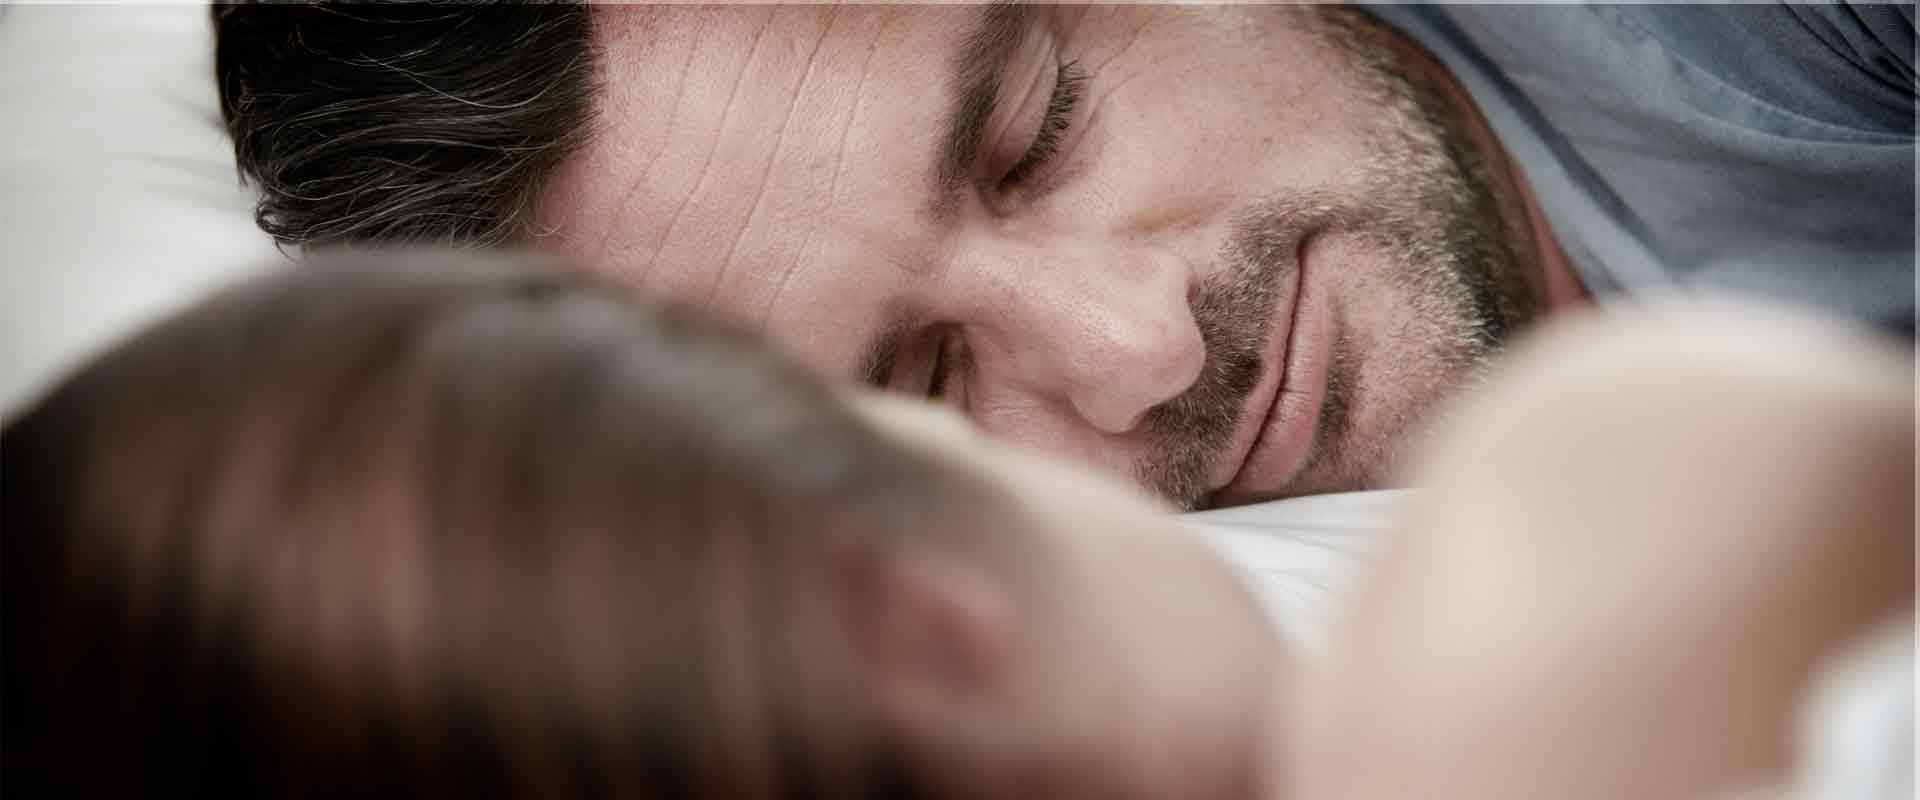 Betten Hoenscheidt Duesseldorf Matratzen Lattenroste guter Schlaf